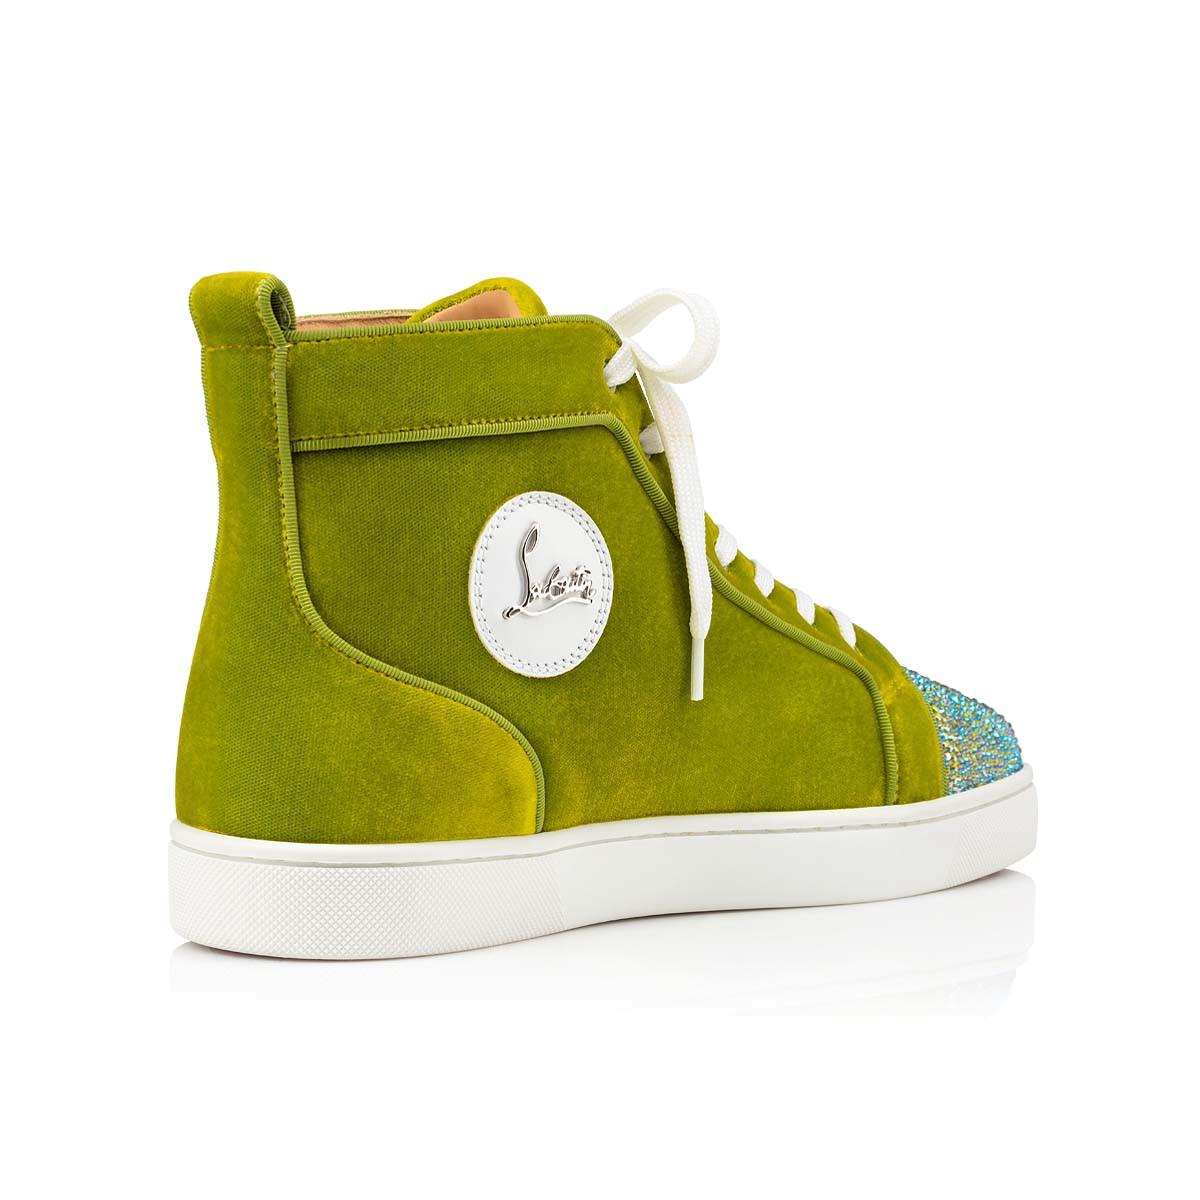 Shoes - Louis P Strass Flat - Christian Louboutin